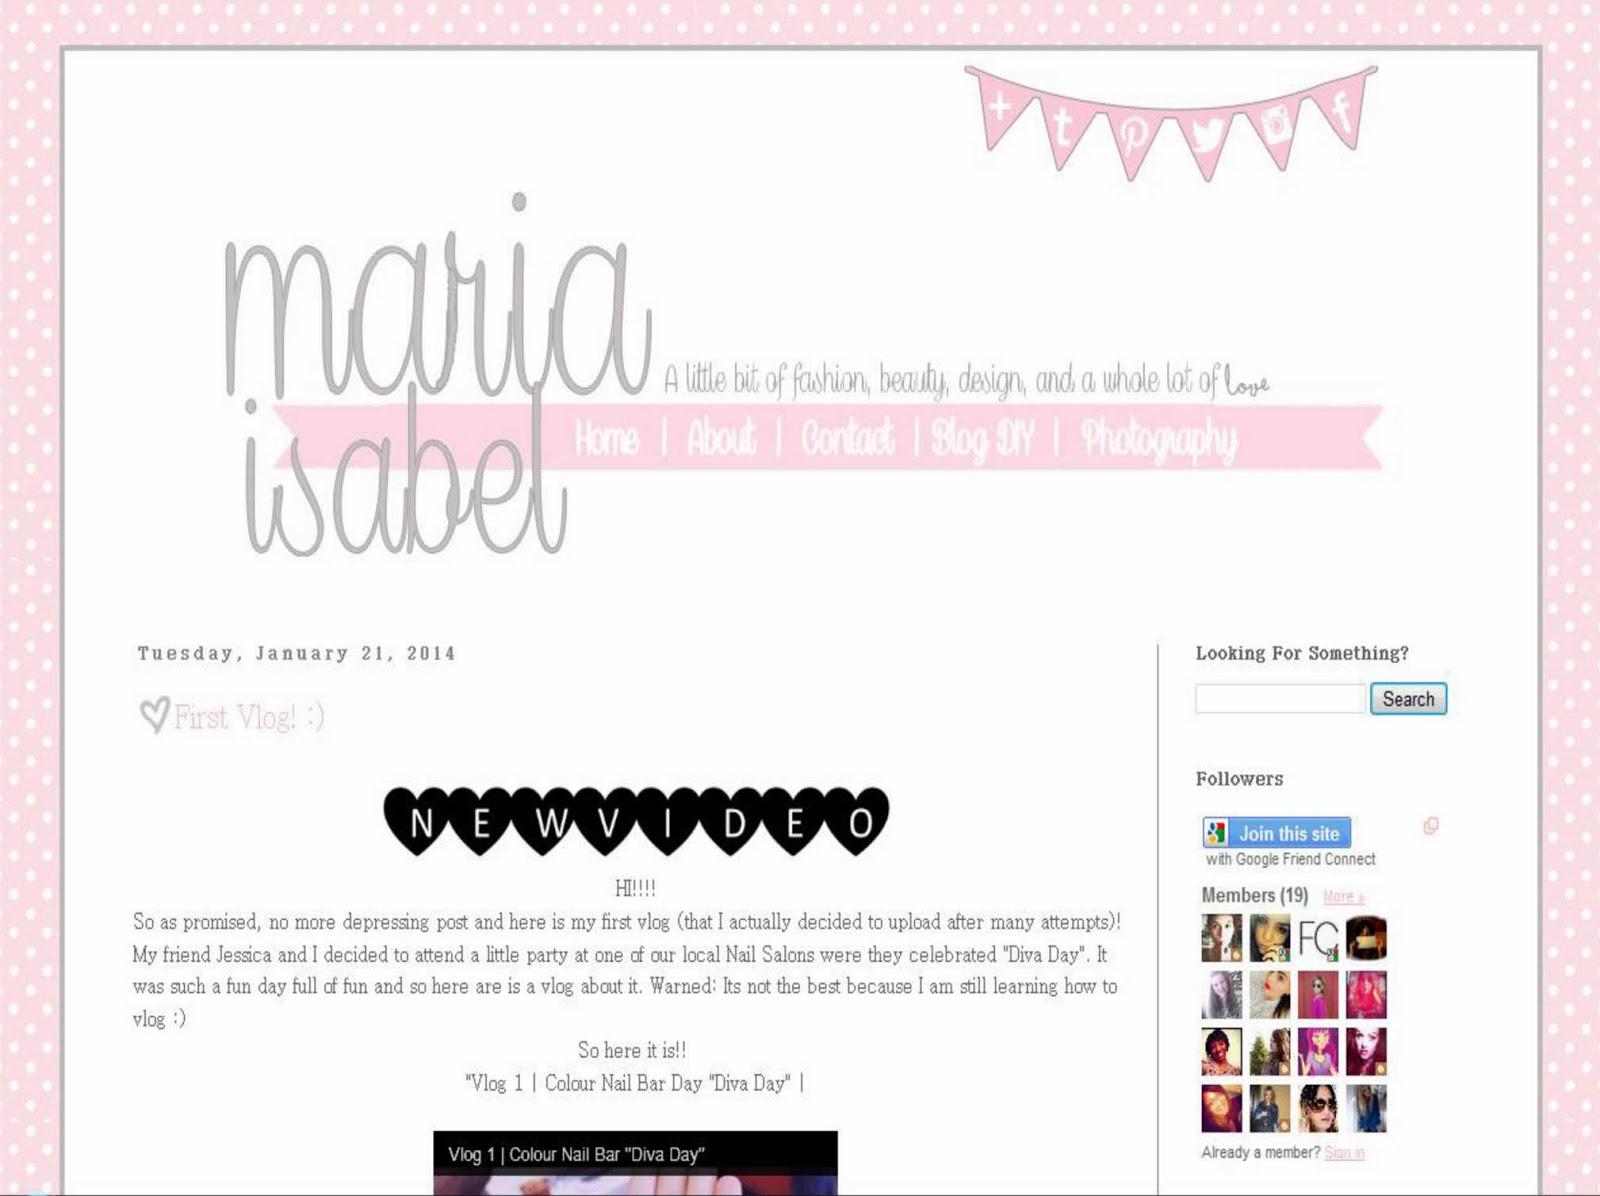 http://misabel5.blogspot.com/